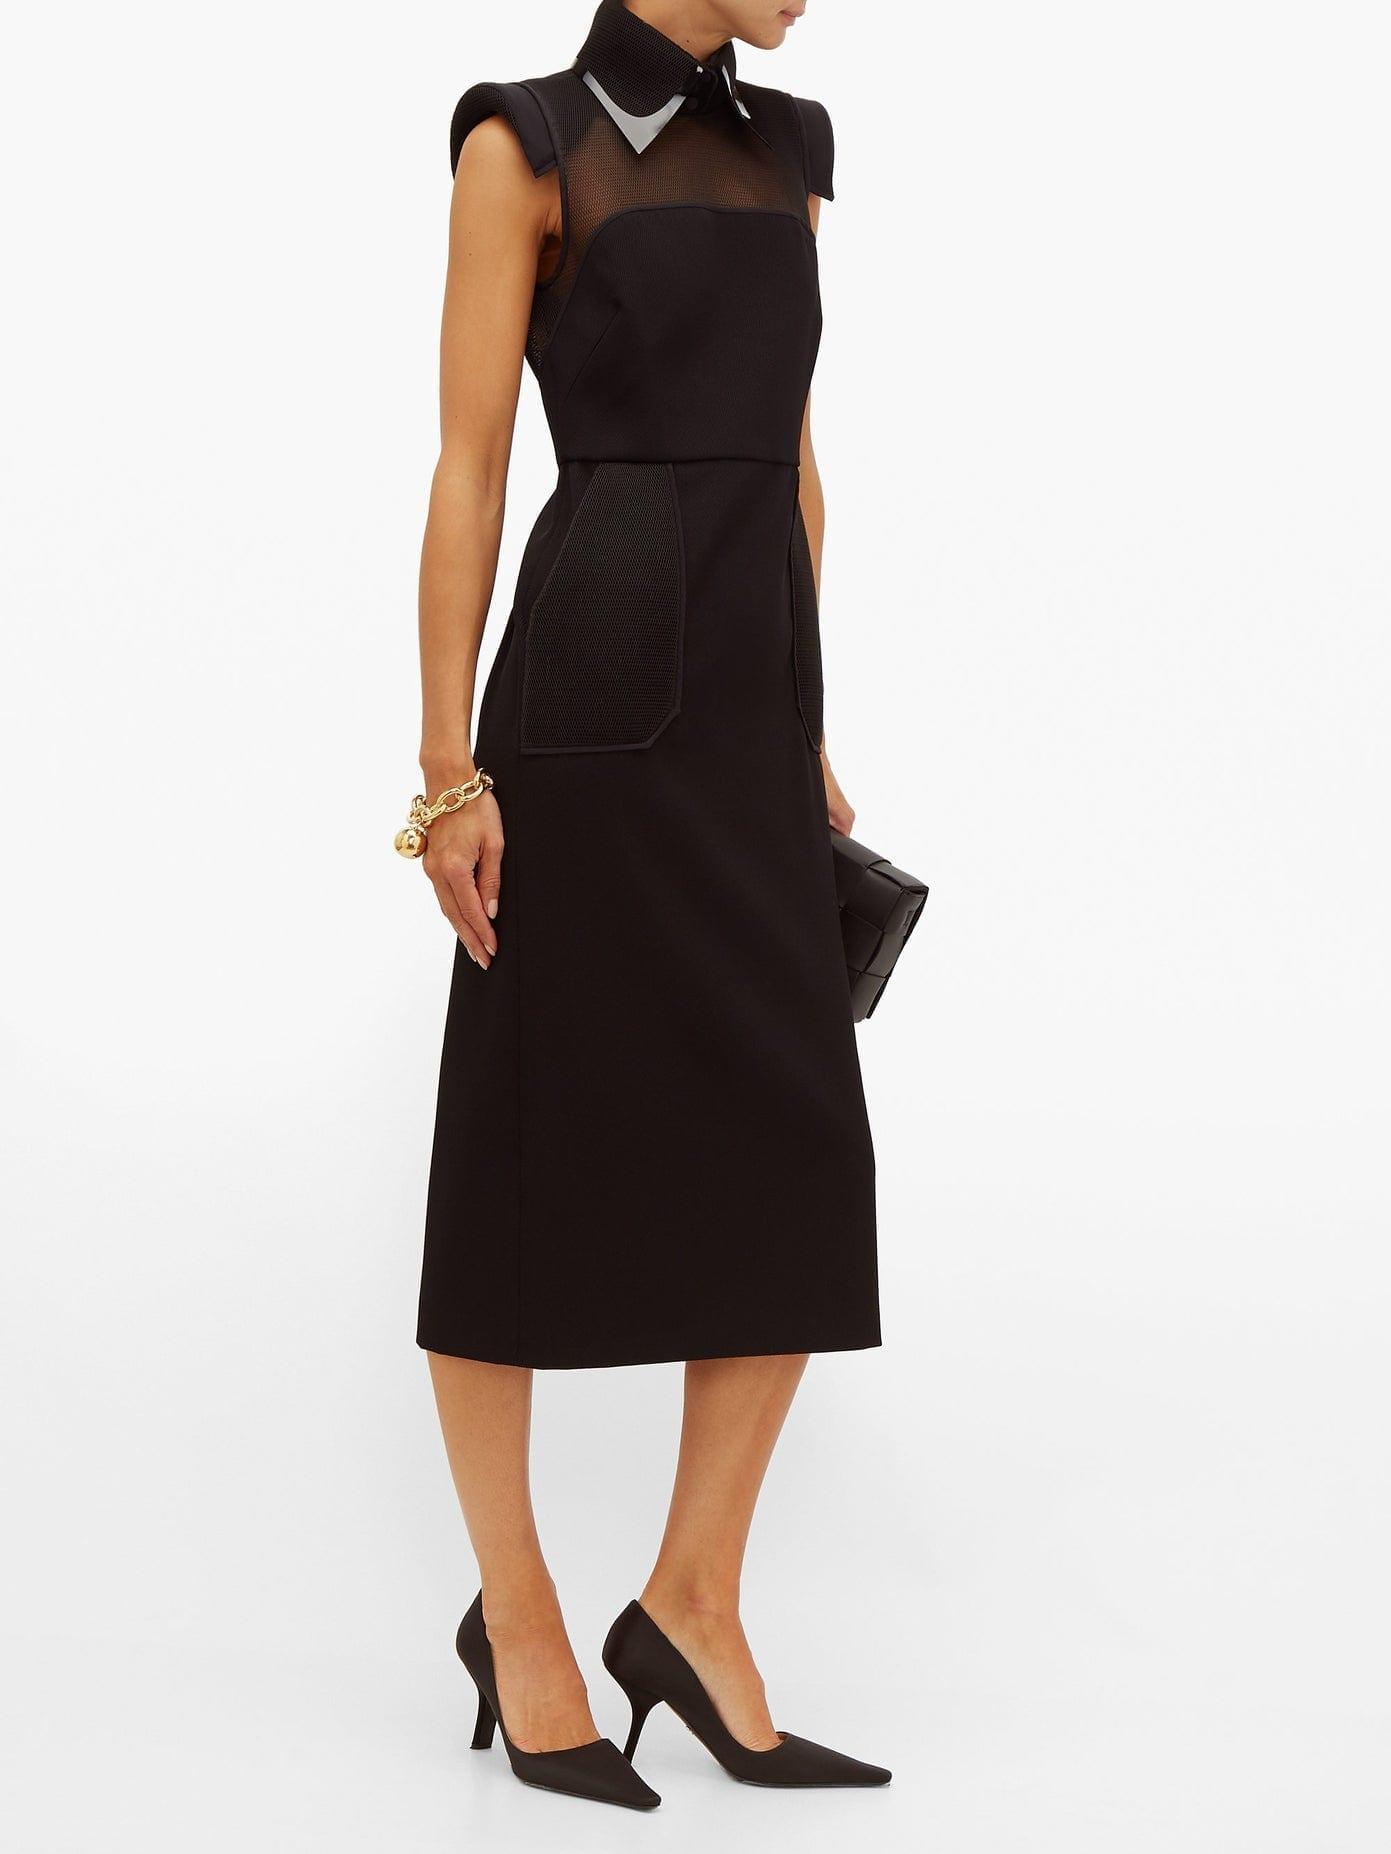 FENDI Pvc Layered Collar Mesh-panelled Wool Dress